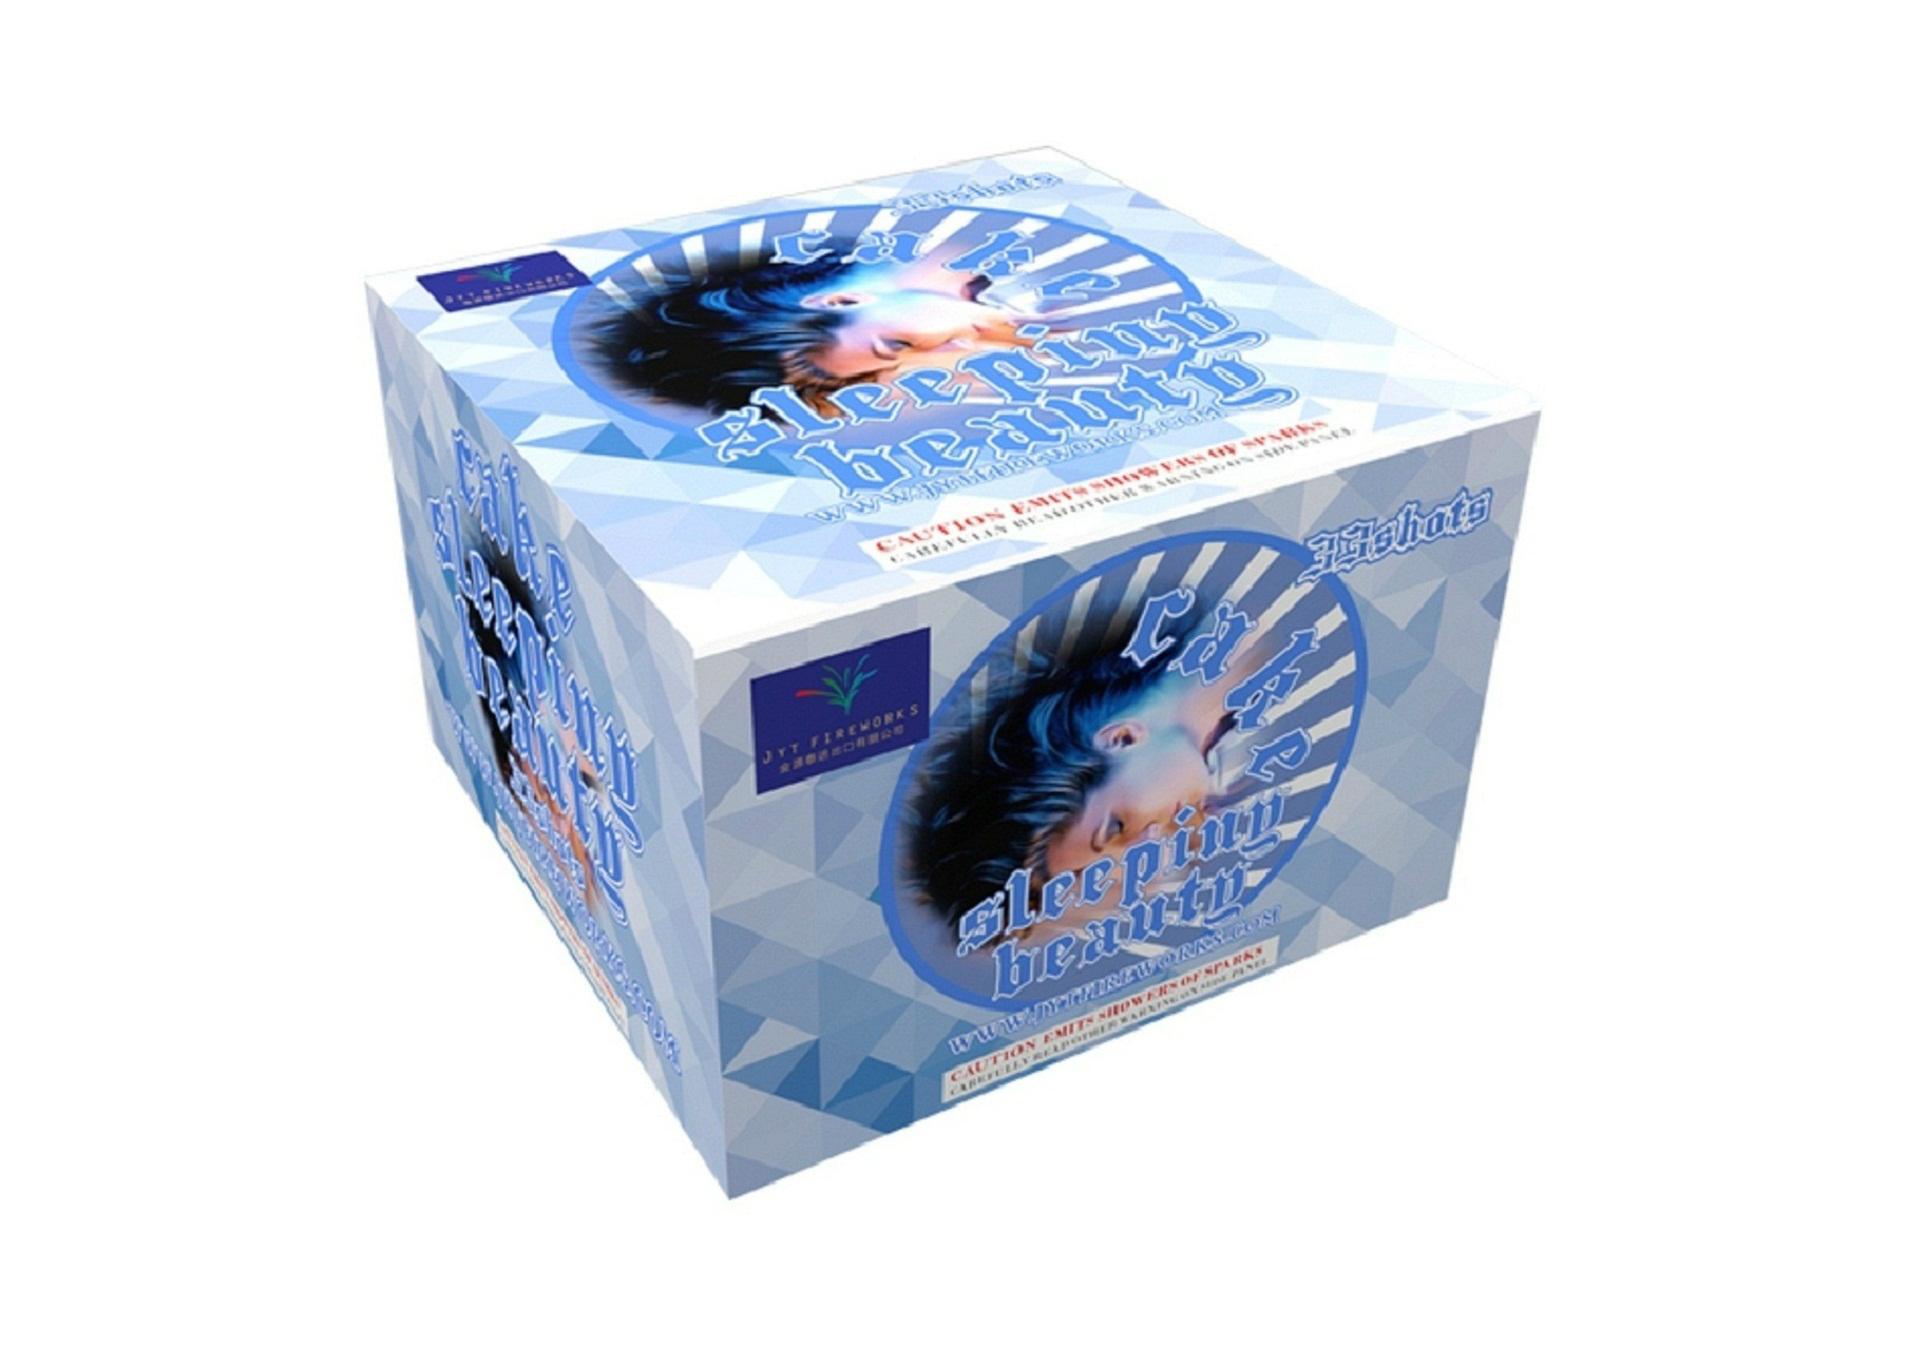 33shots Cake (JYTA030068) Fireworks 1